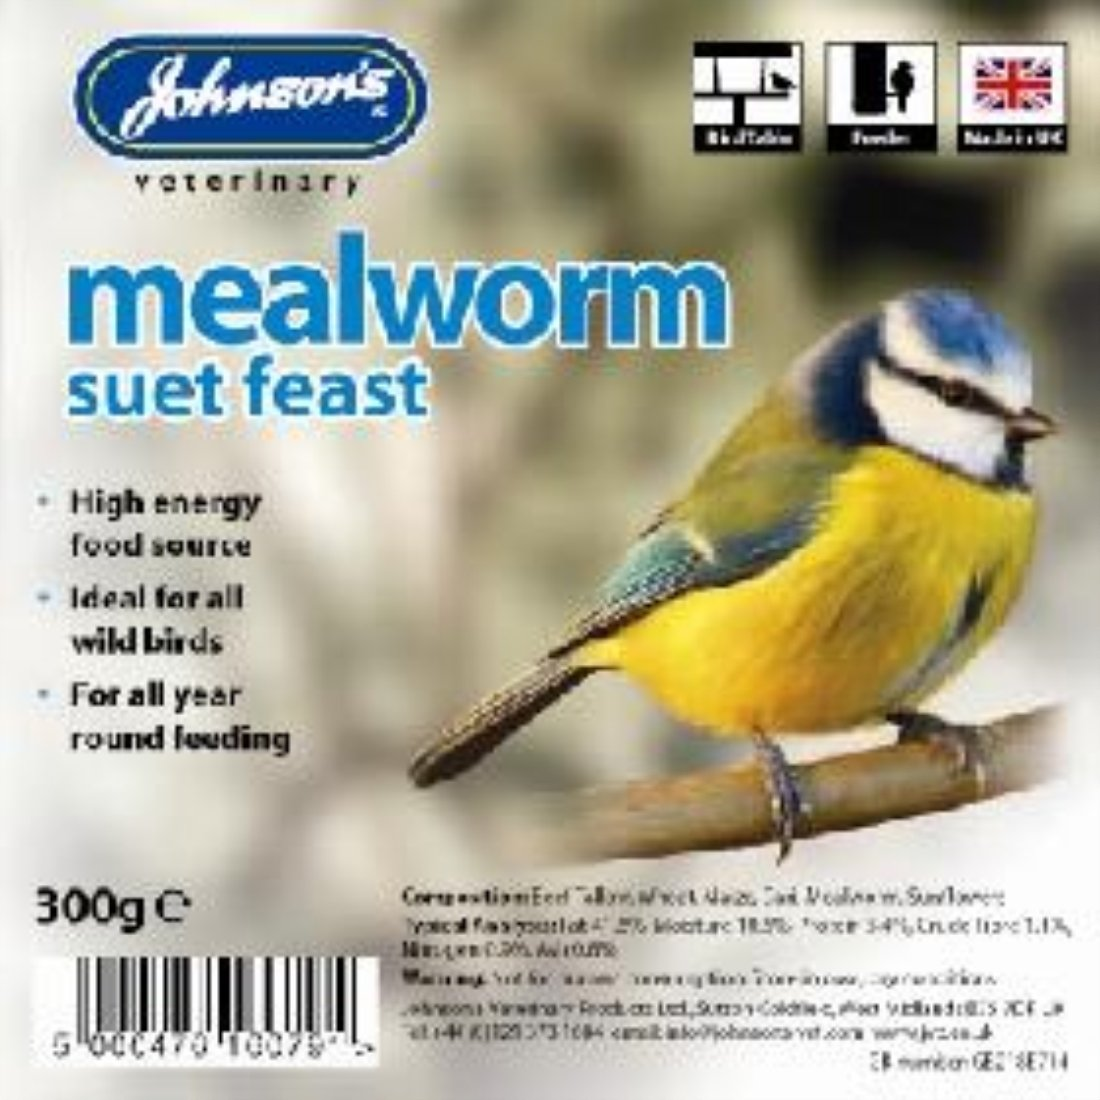 Wild Bird Suet Tray Mealworm 300g X 8 160791 34868